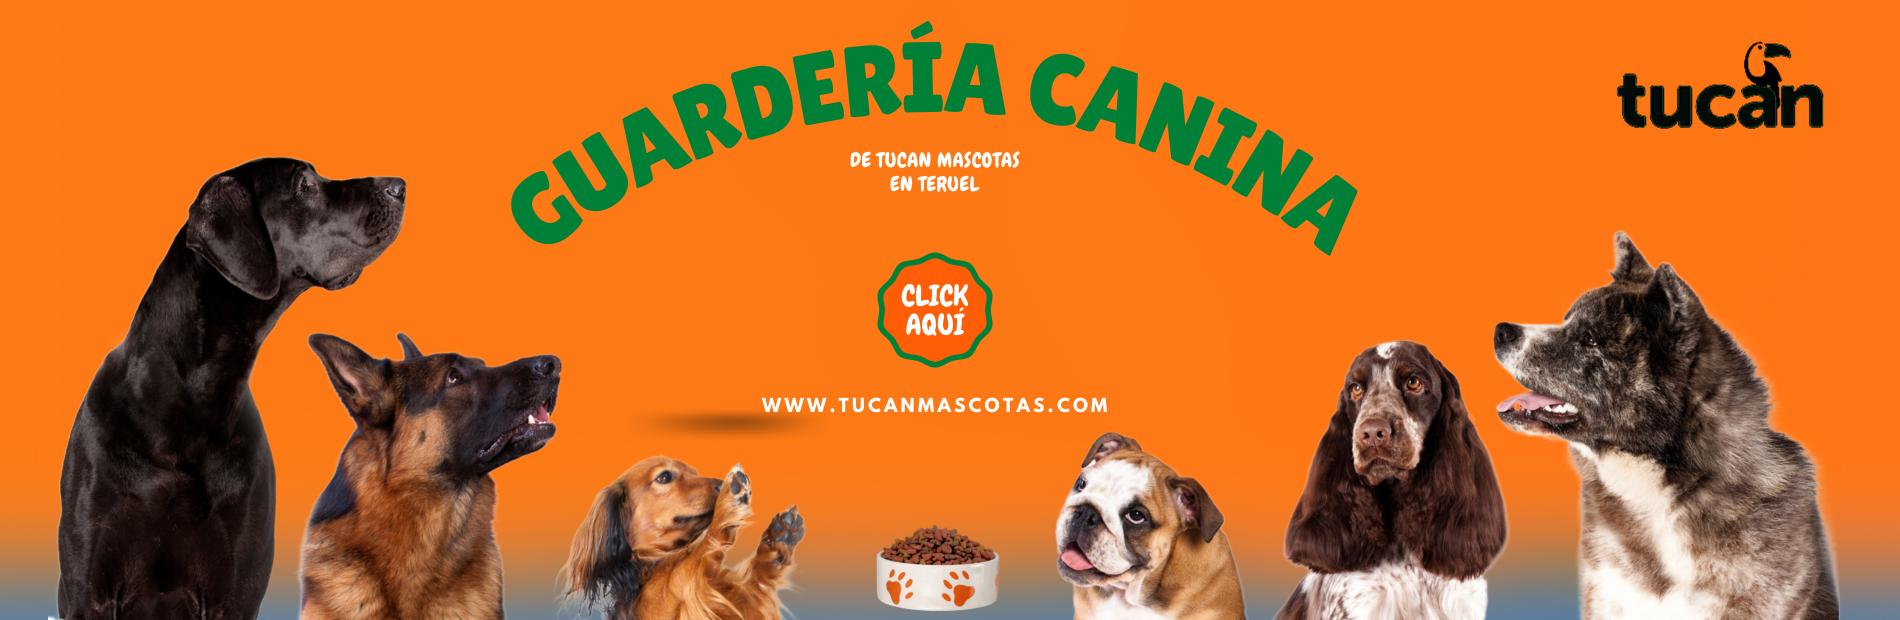 GUARDERIA CANINA TUCAN